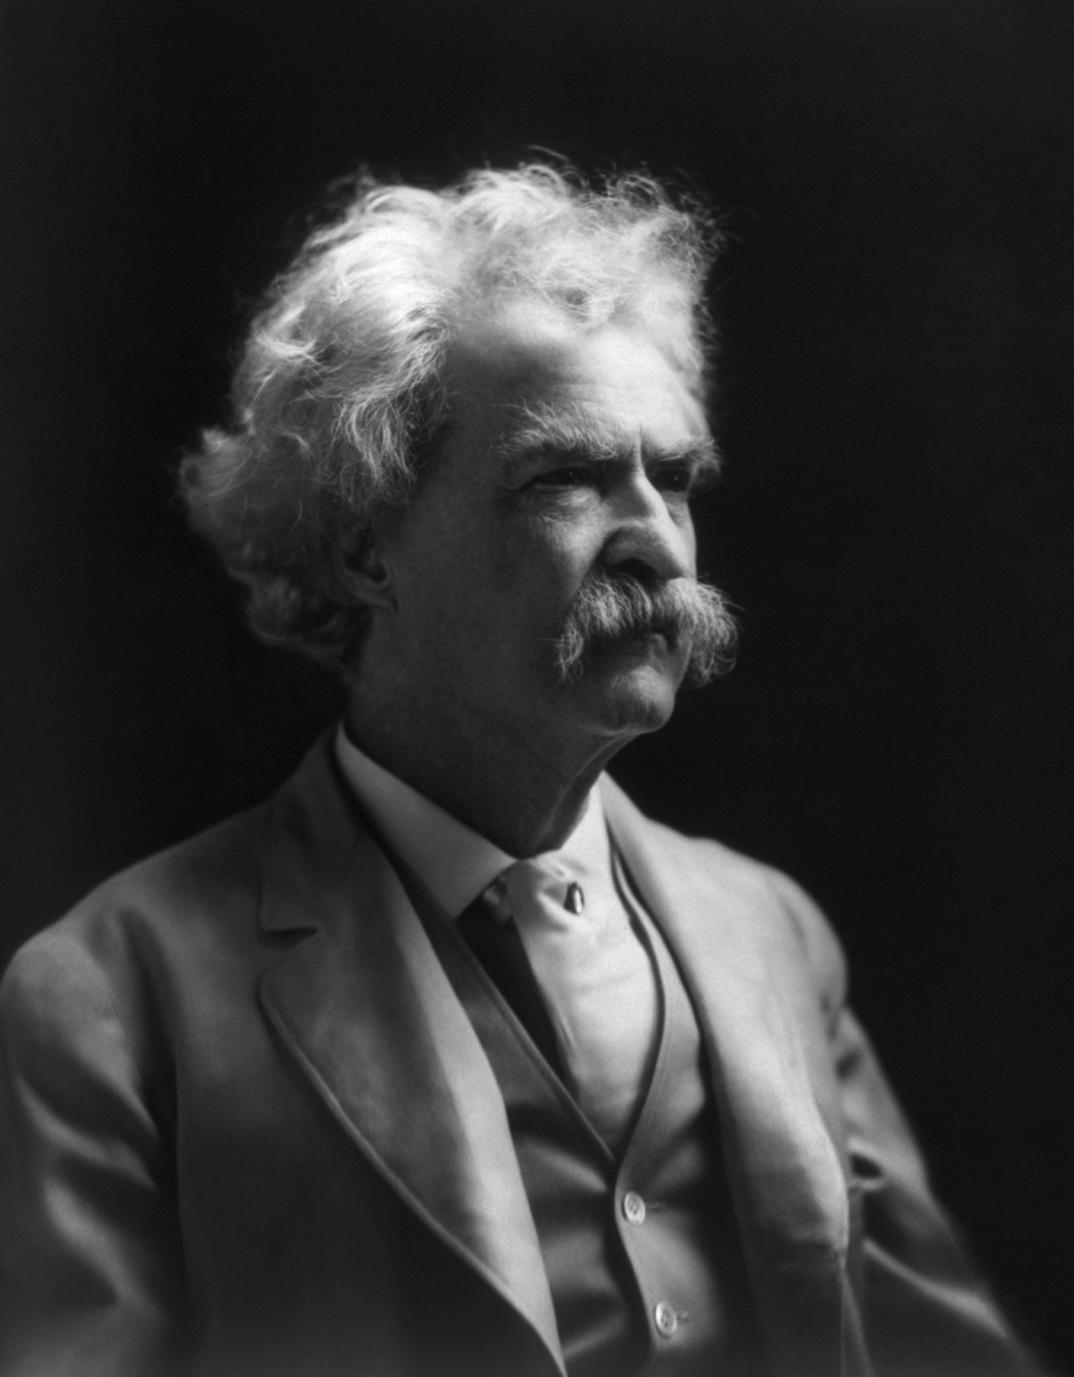 Twain1909.jpg (604 KB)